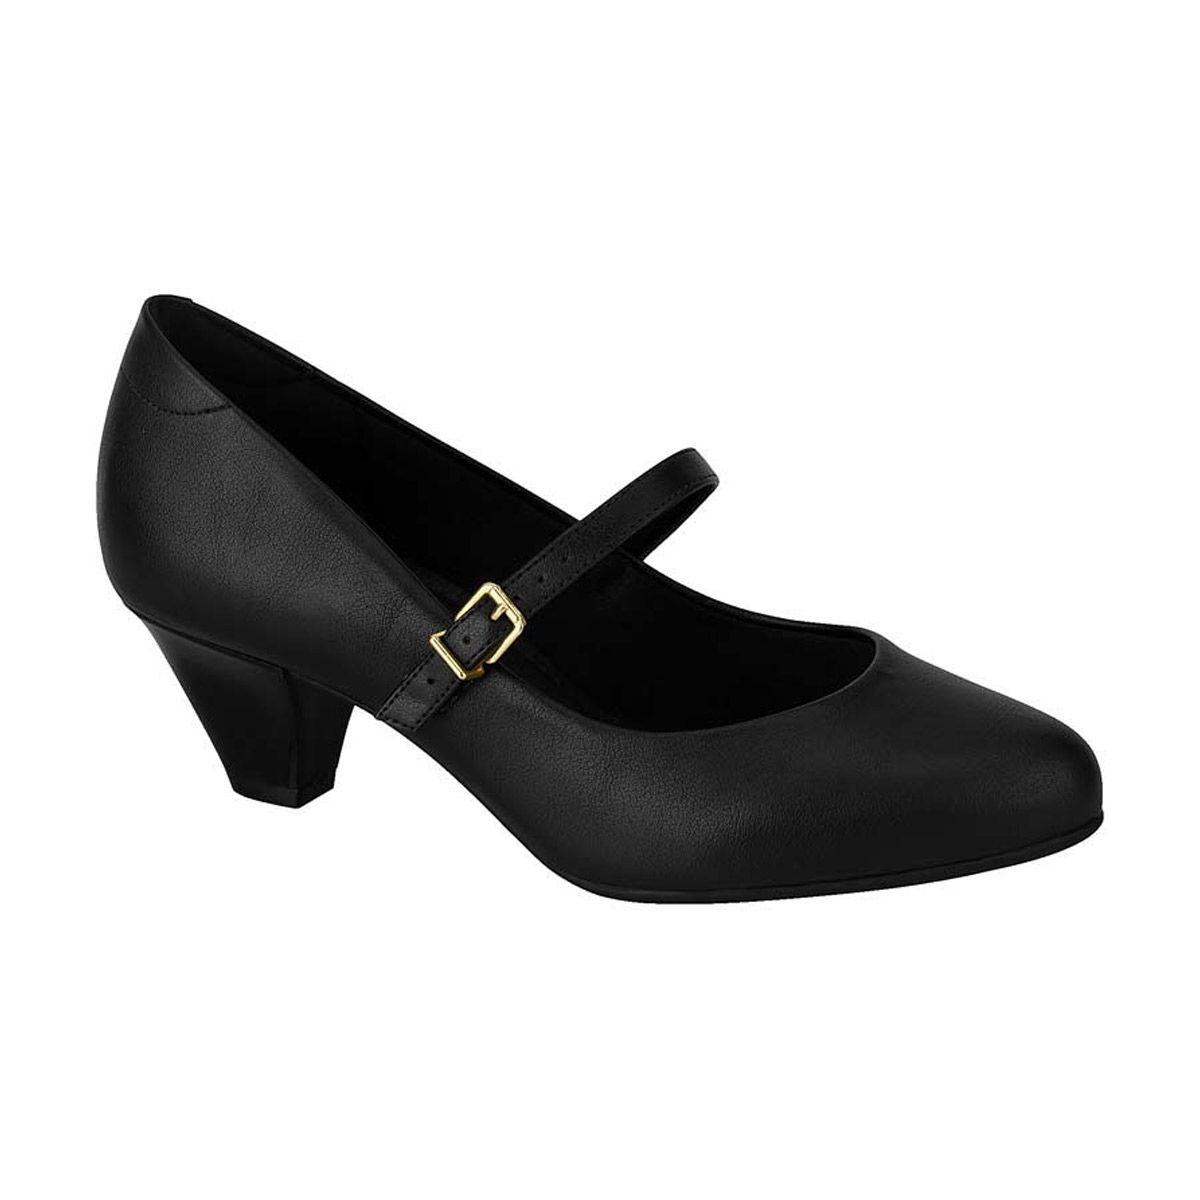 Sapato Feminino Salto Baixo com Fivela Modare 7005.641